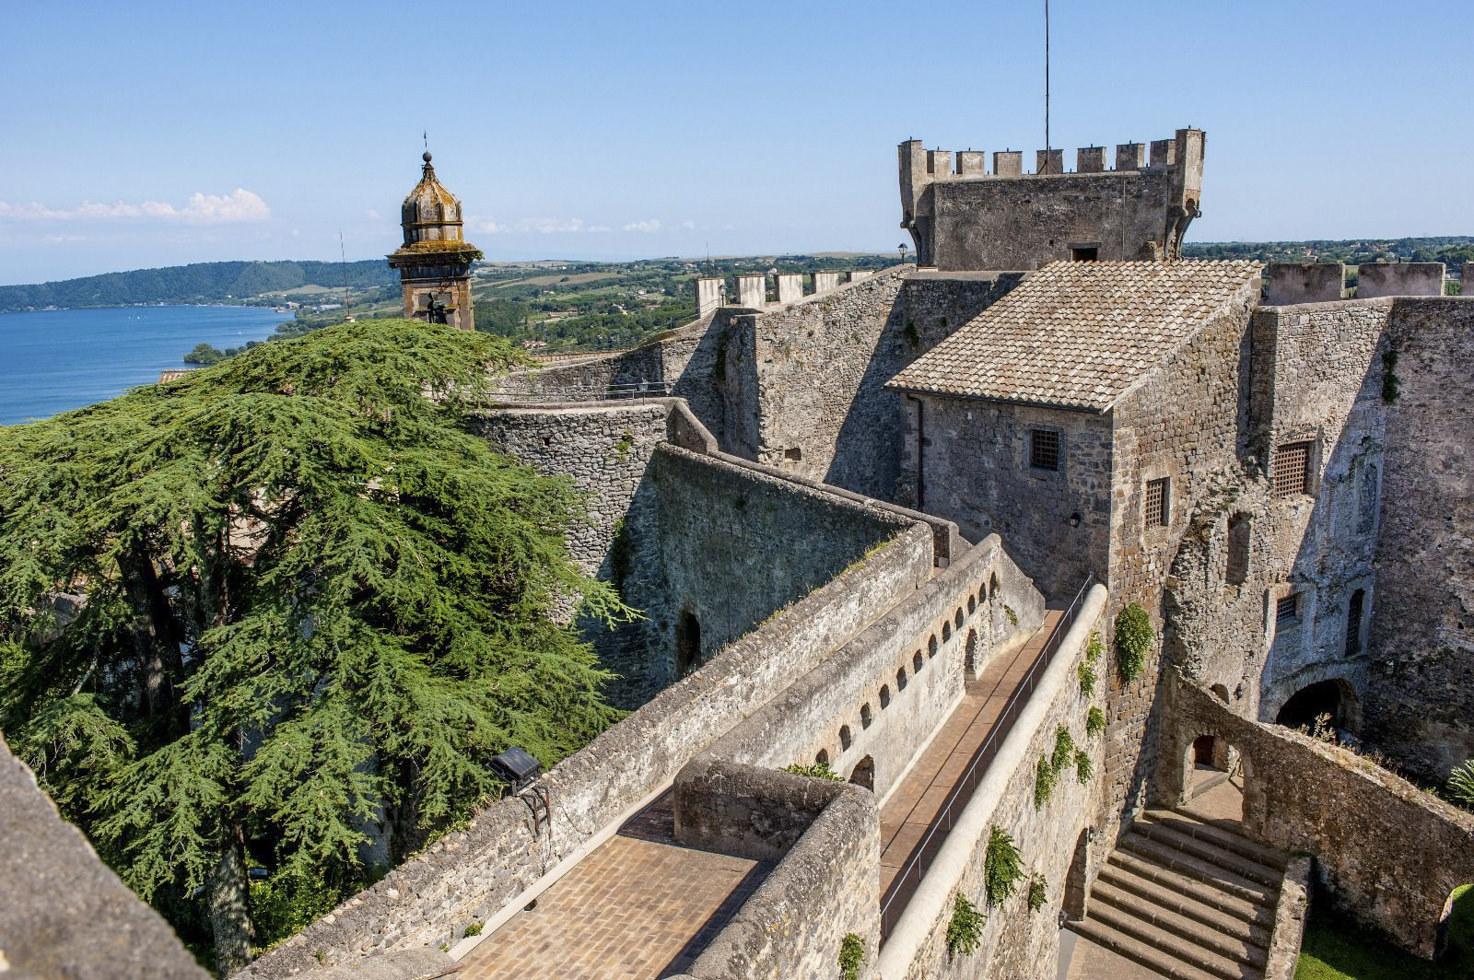 Rooftop of Castello Odescalchi